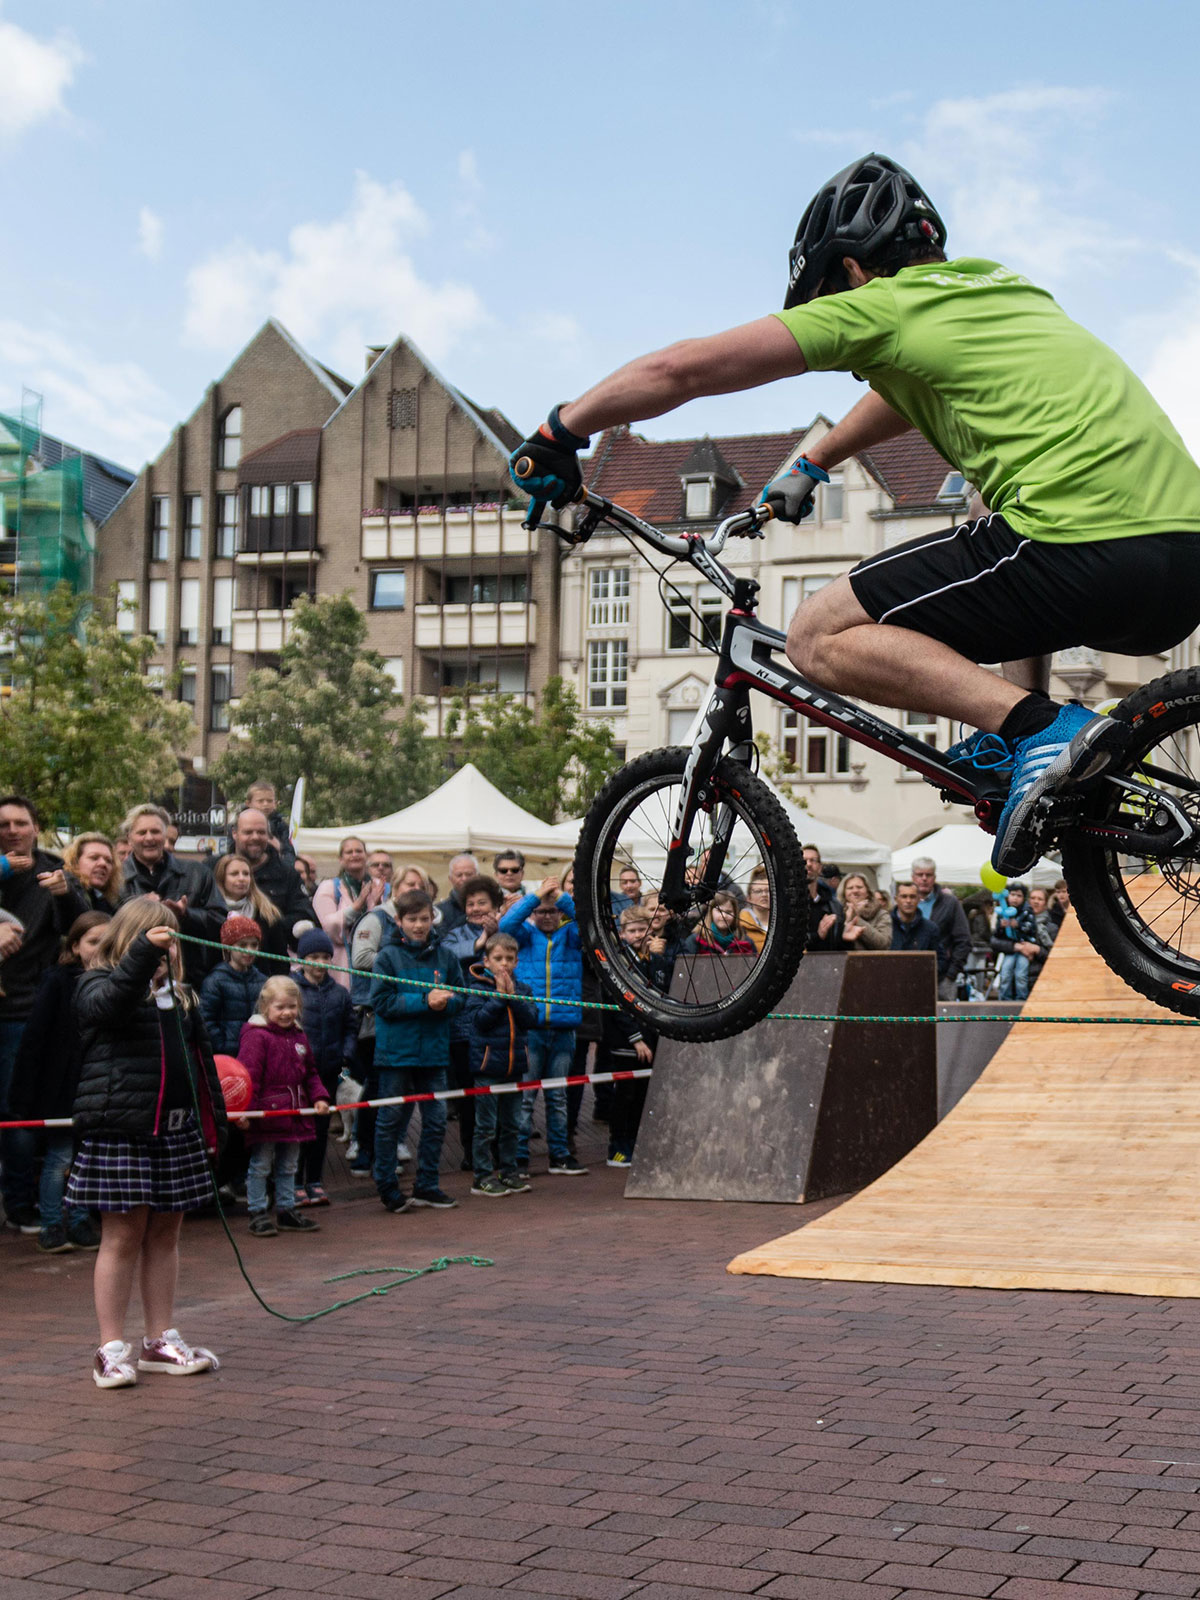 daniel-rall-bike-artist-hornberg-show-bike-coaching